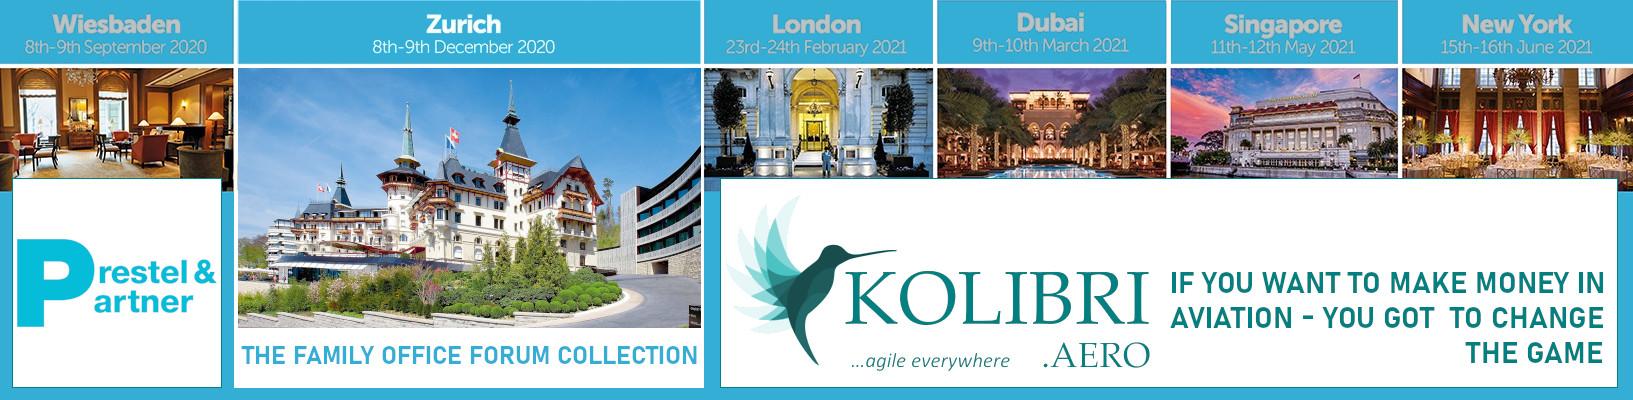 Kolibri @ Prestel&Partner Zurich December 2020